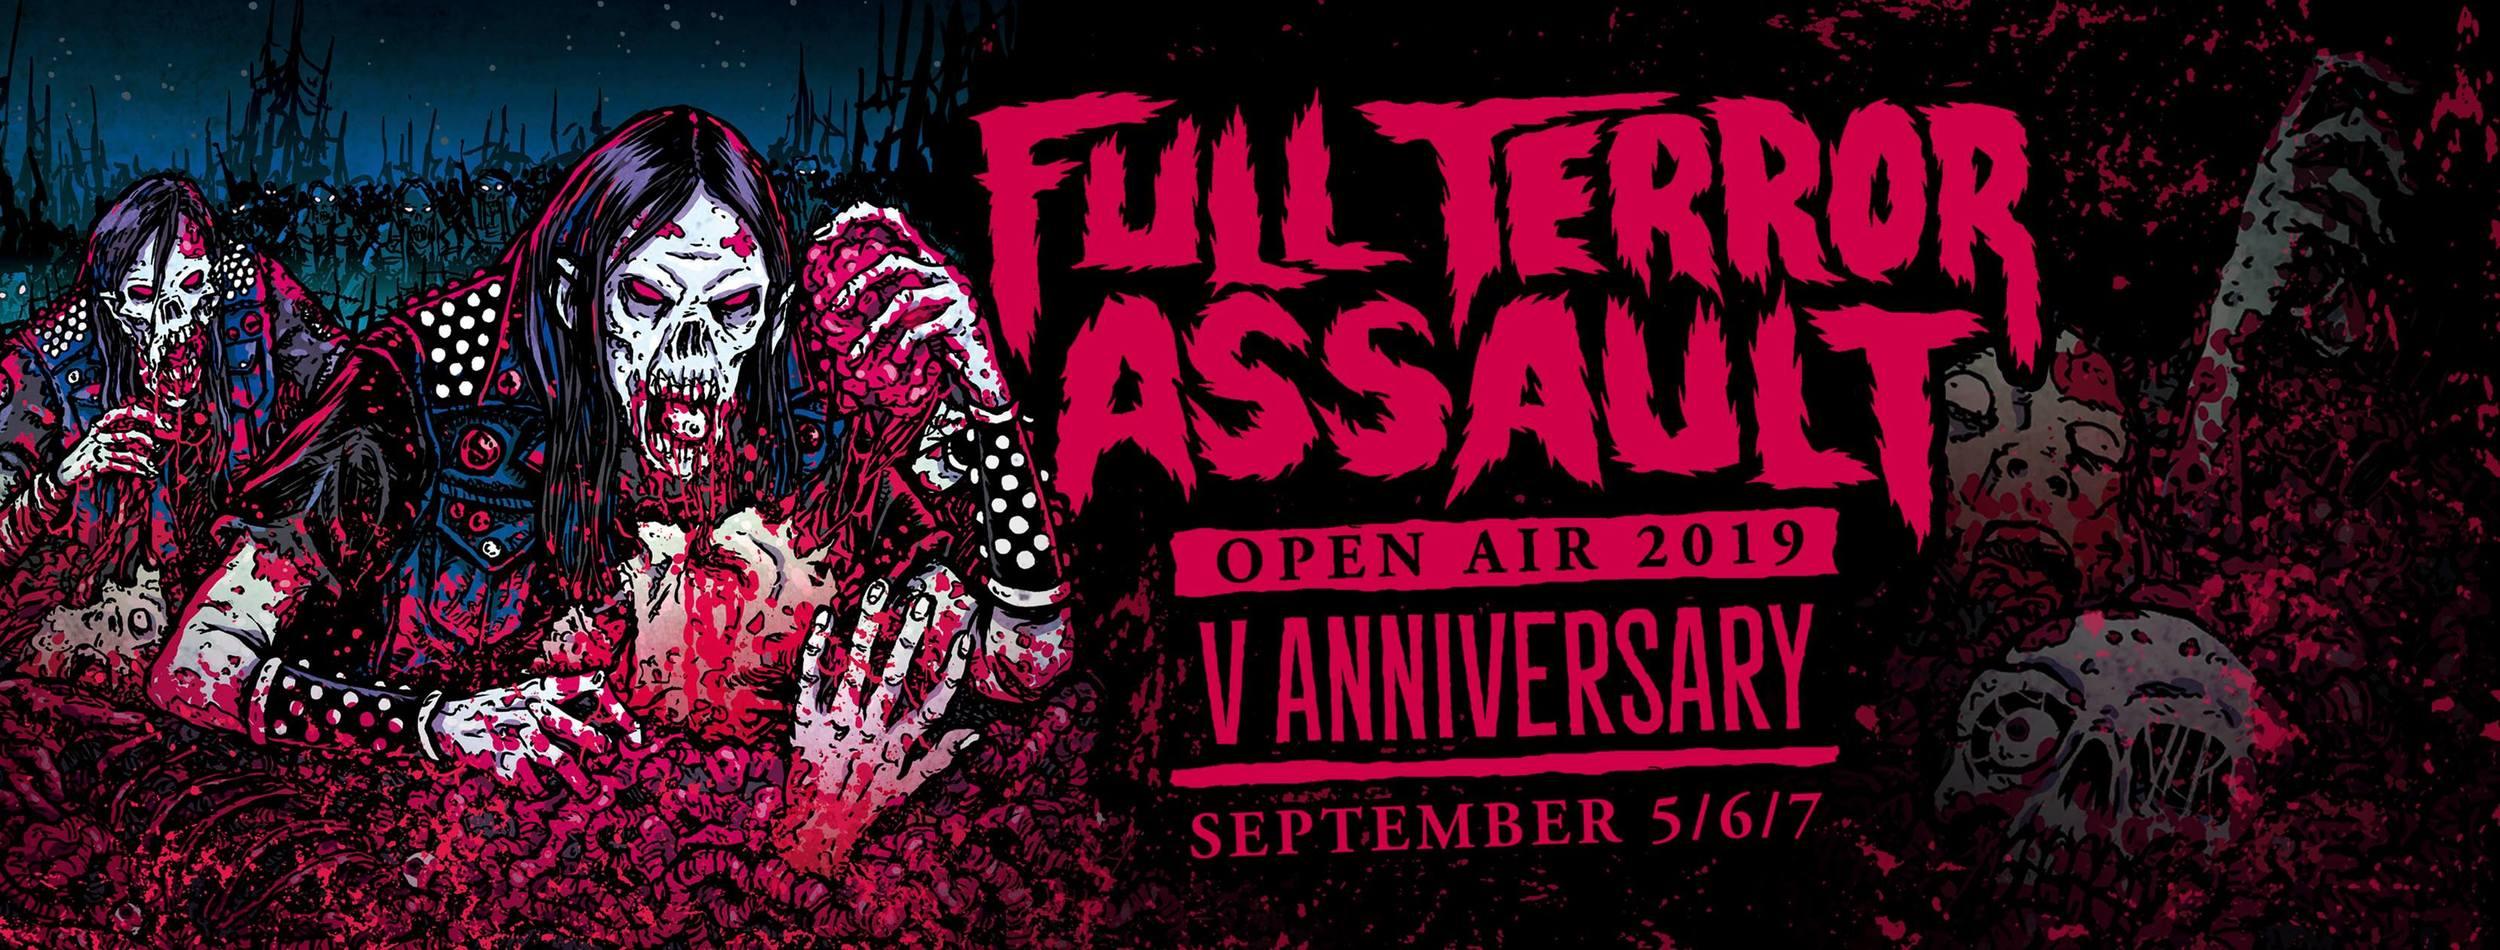 Full Terror Assault 2019 Metal Festival